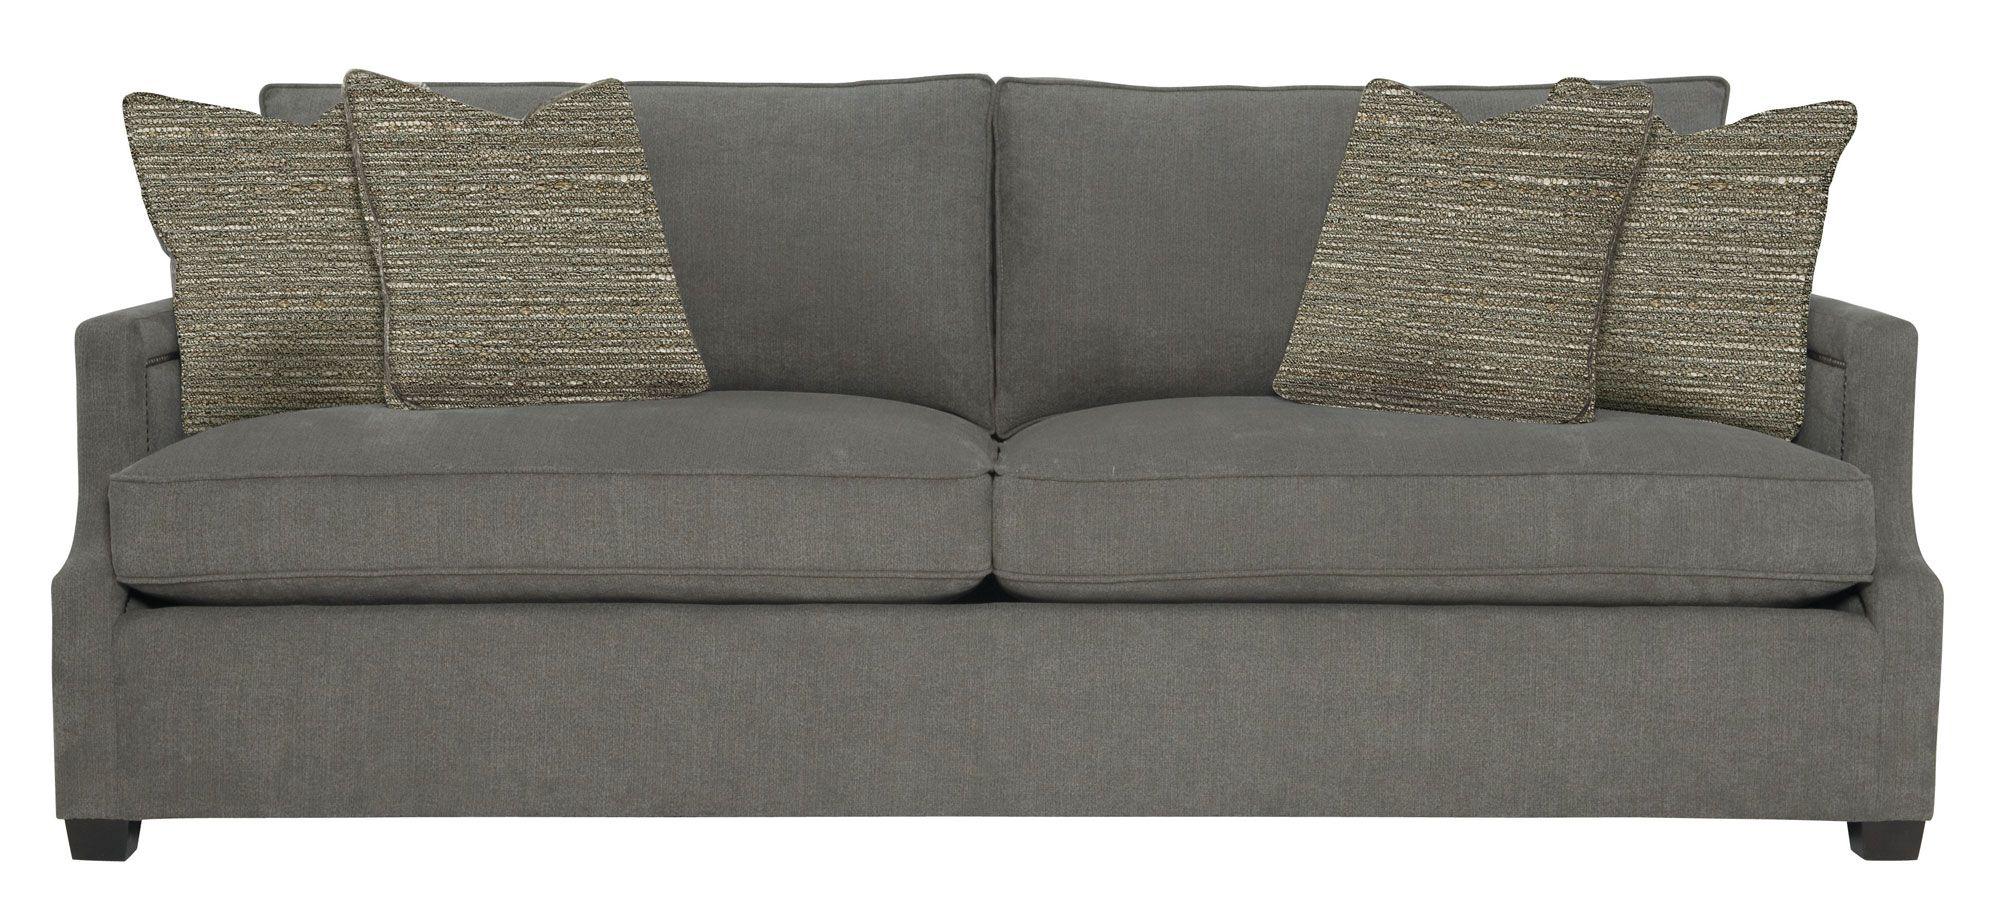 Bernhardt Sofa Leather And Fabric Moss Studio Reviews Energywarden